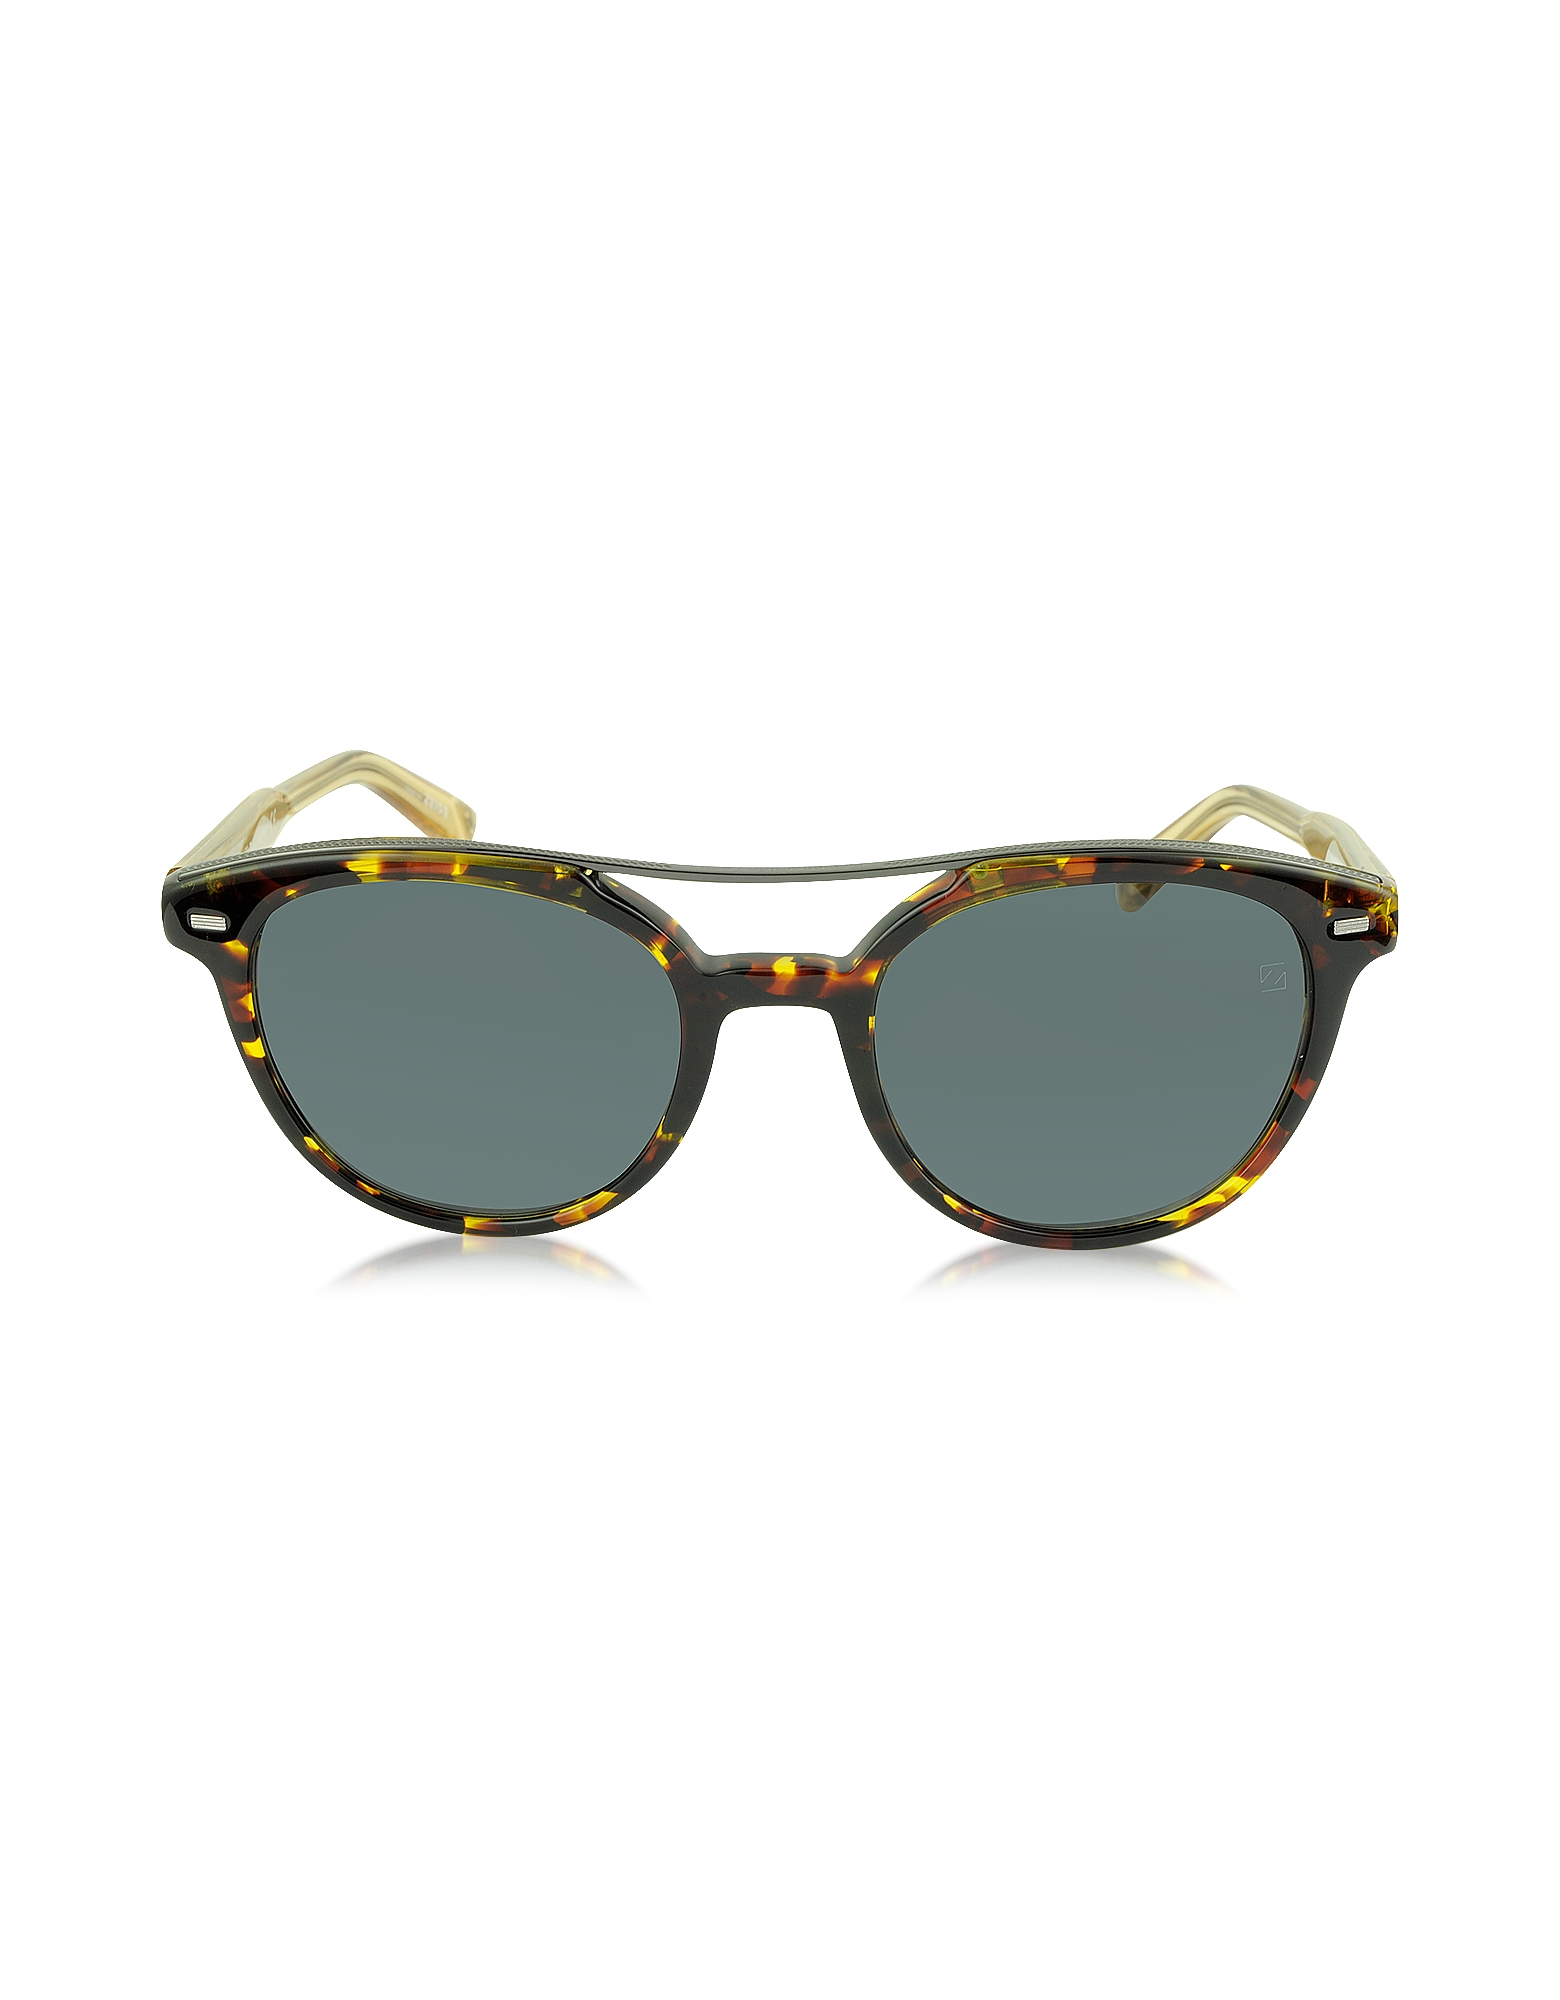 Ermenegildo Zegna Designer Sunglasses, EZ0006 52A Havana & Gold Acetate Round Men's Sunglasses